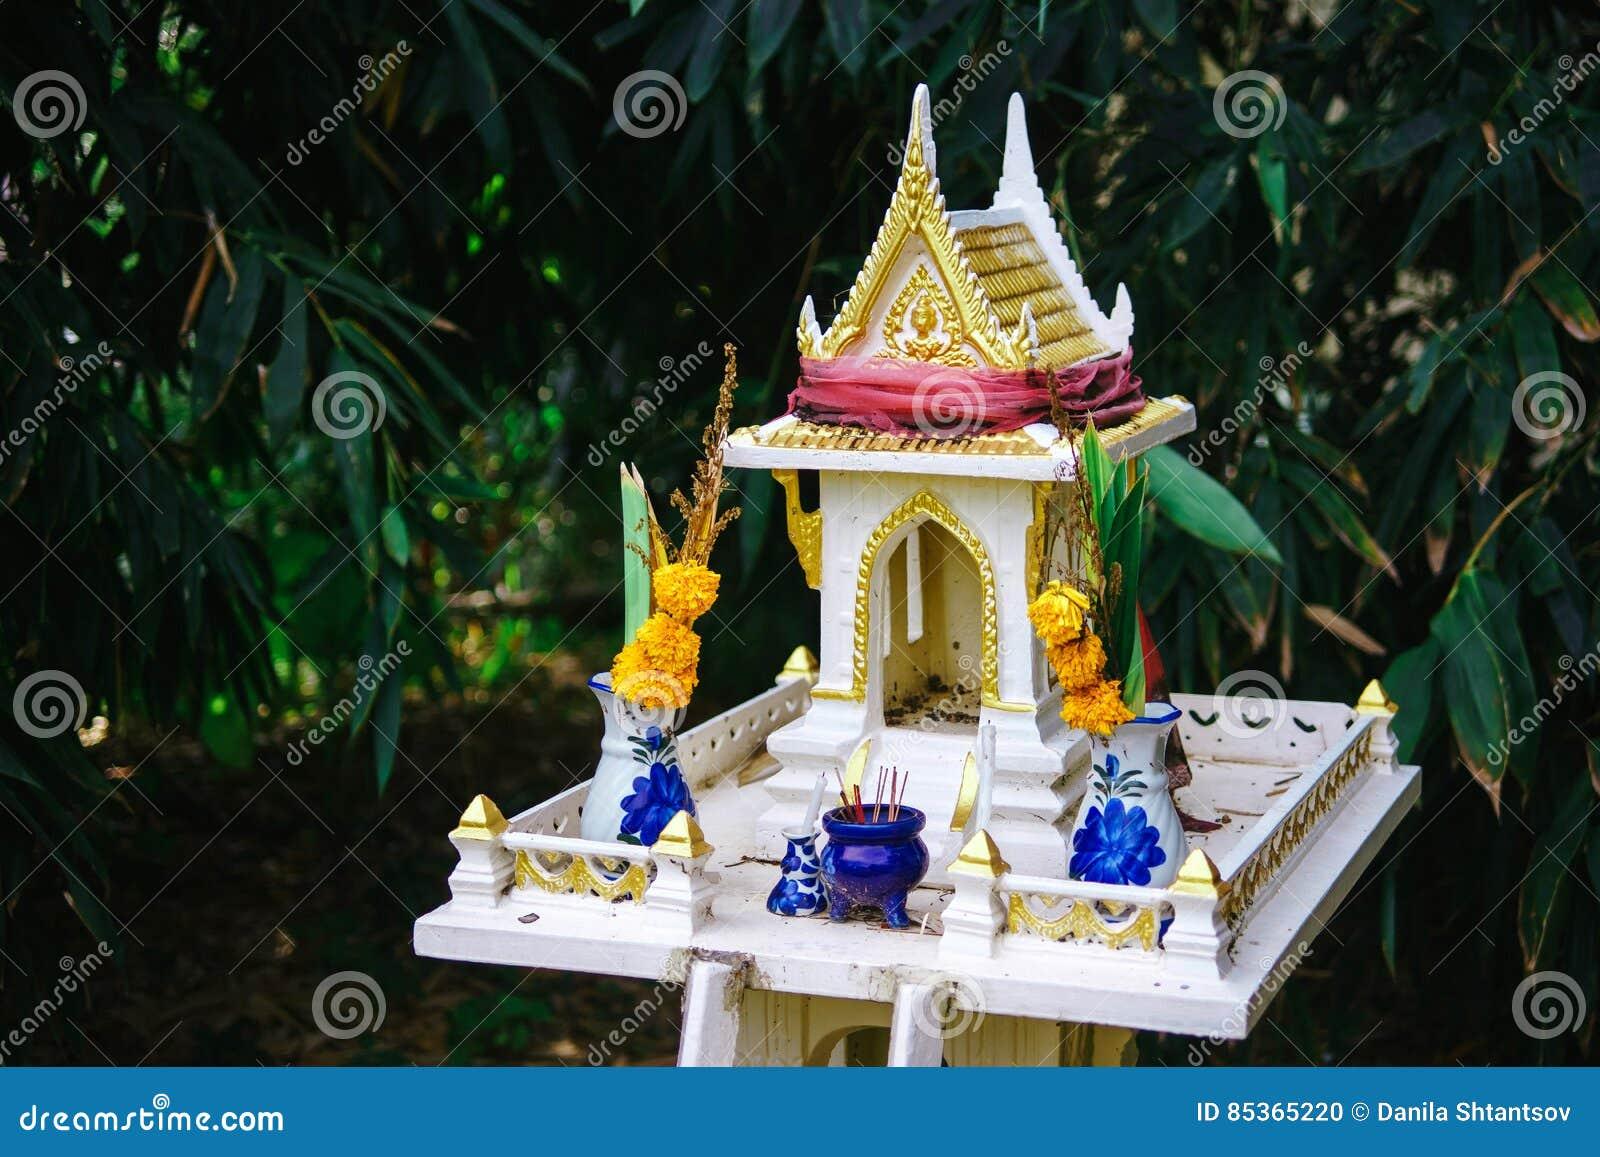 Thai house for spirits stock photo  Image of food, lifestyle - 85365220